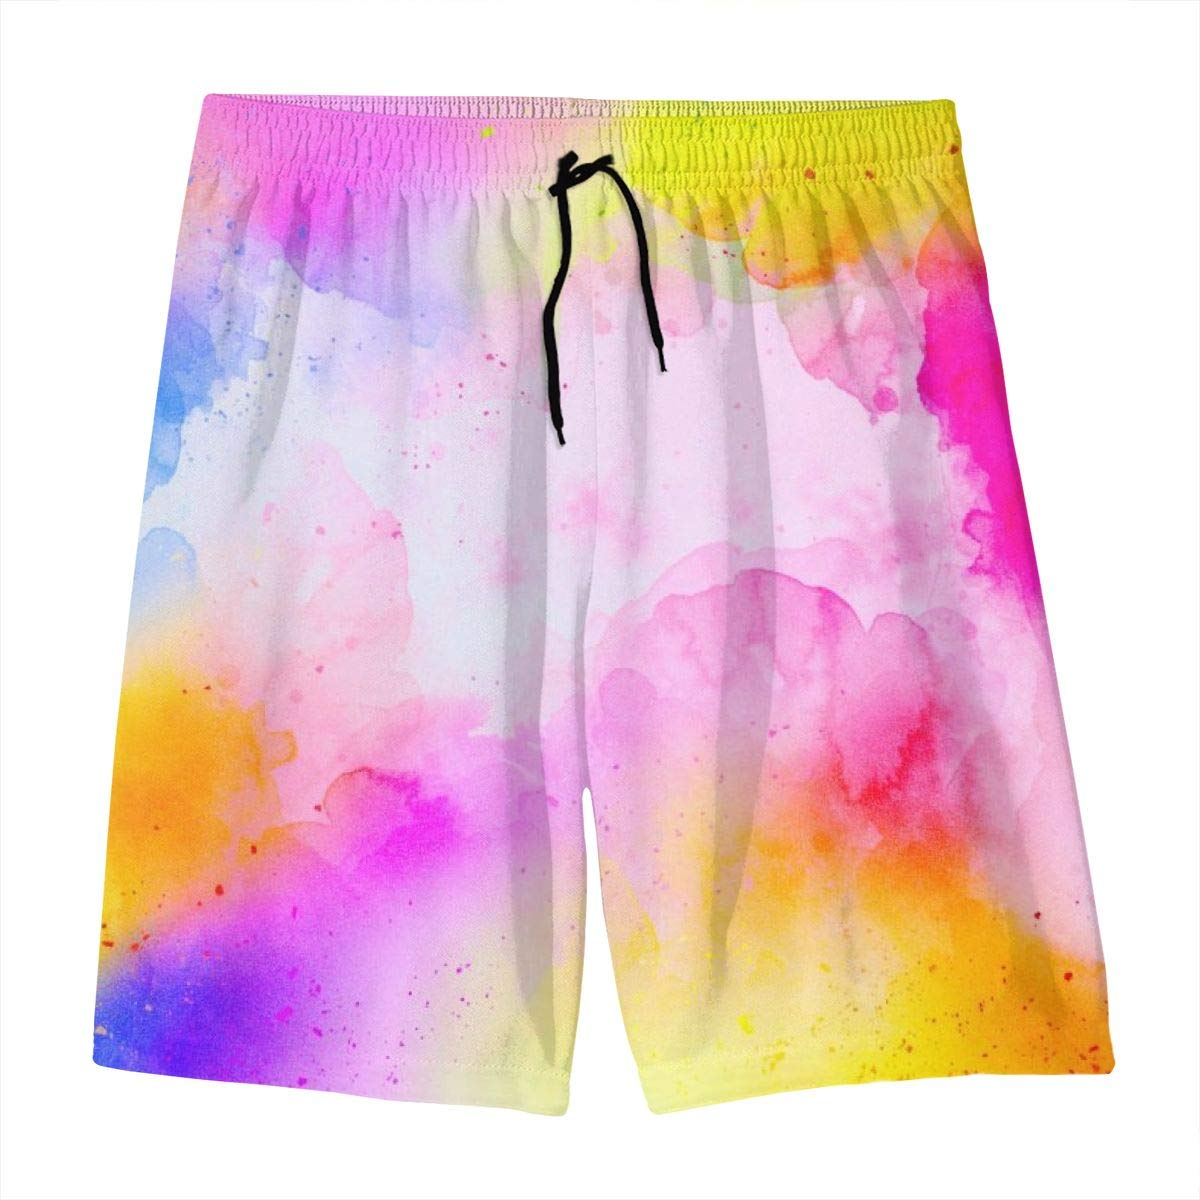 Rigg-pants Men Comfortable Hawaii Beach Camping Cool Beach Shorts Swim Trunks Board Shorts